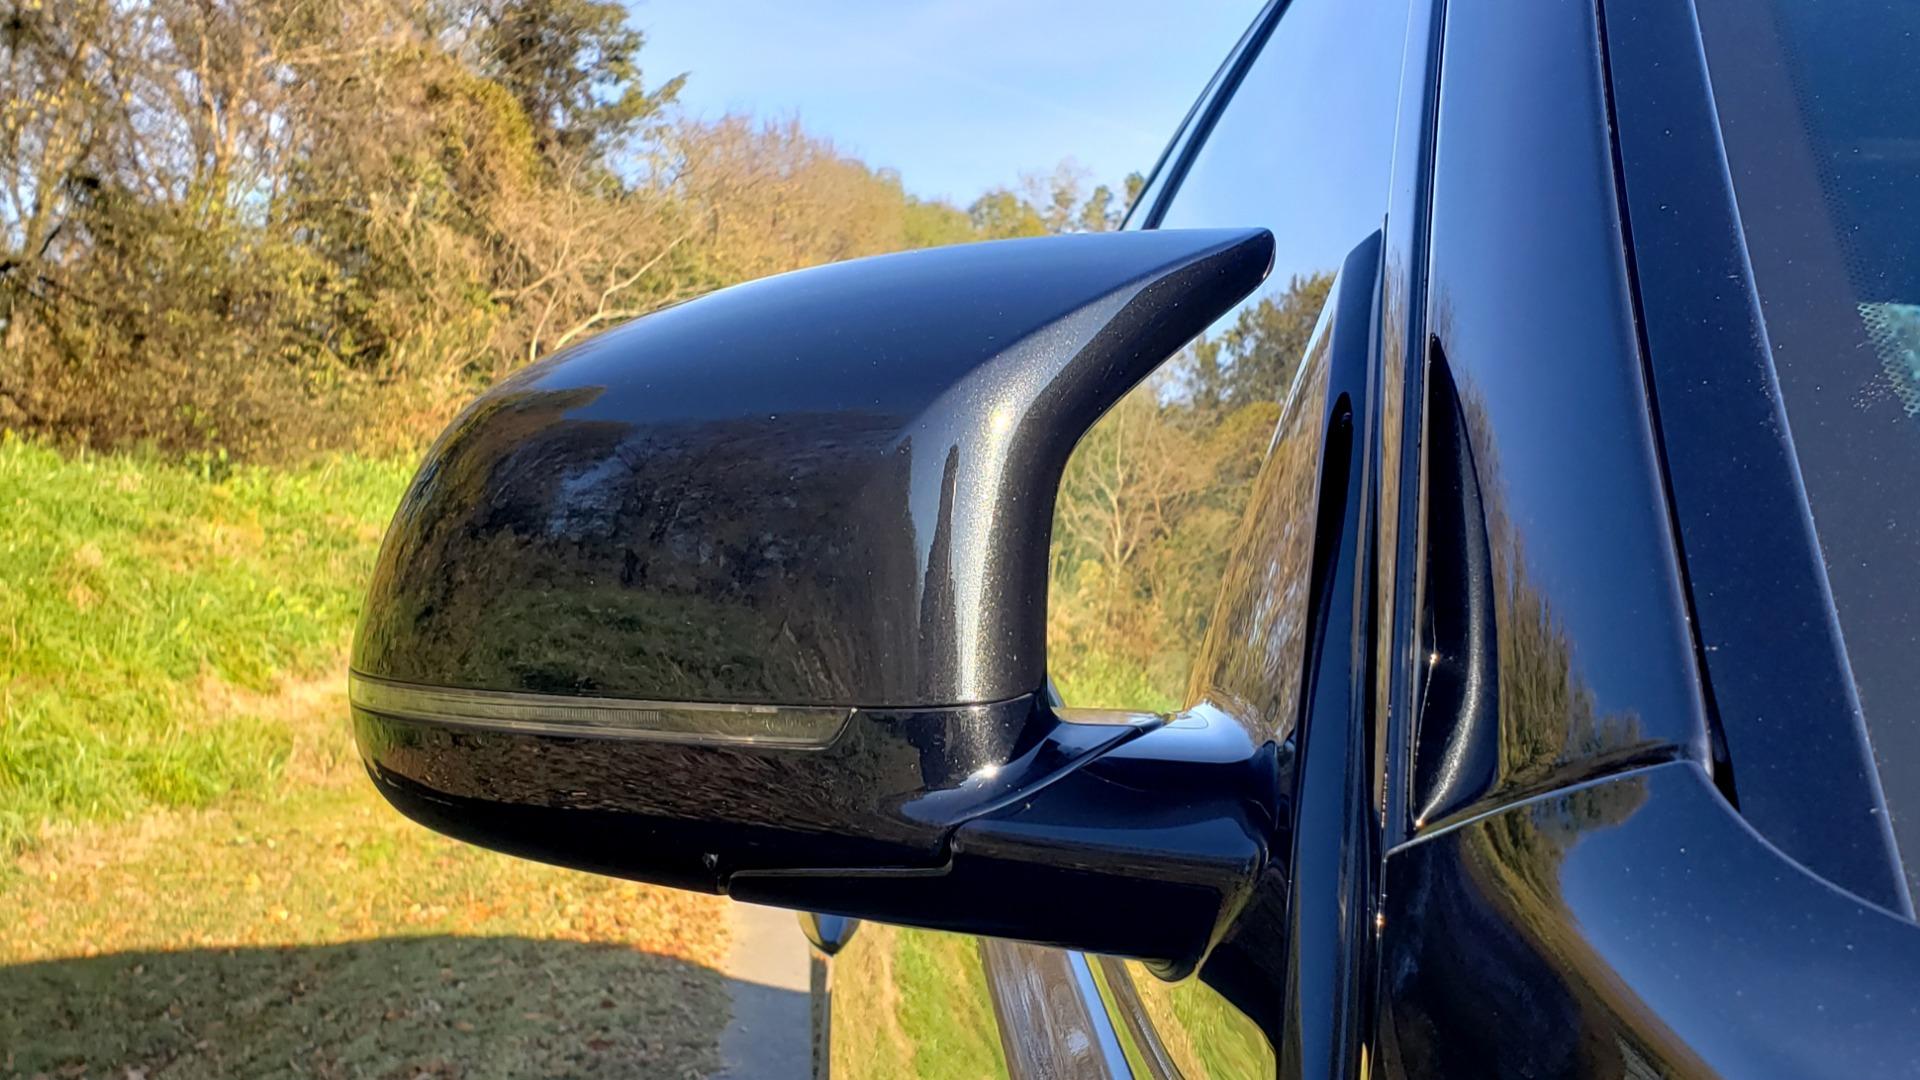 Used 2016 BMW X6 M EXEC PKG / DRVR ASST / NAV / SUNROOF / BLIND SPOT / REARVIEW for sale Sold at Formula Imports in Charlotte NC 28227 15